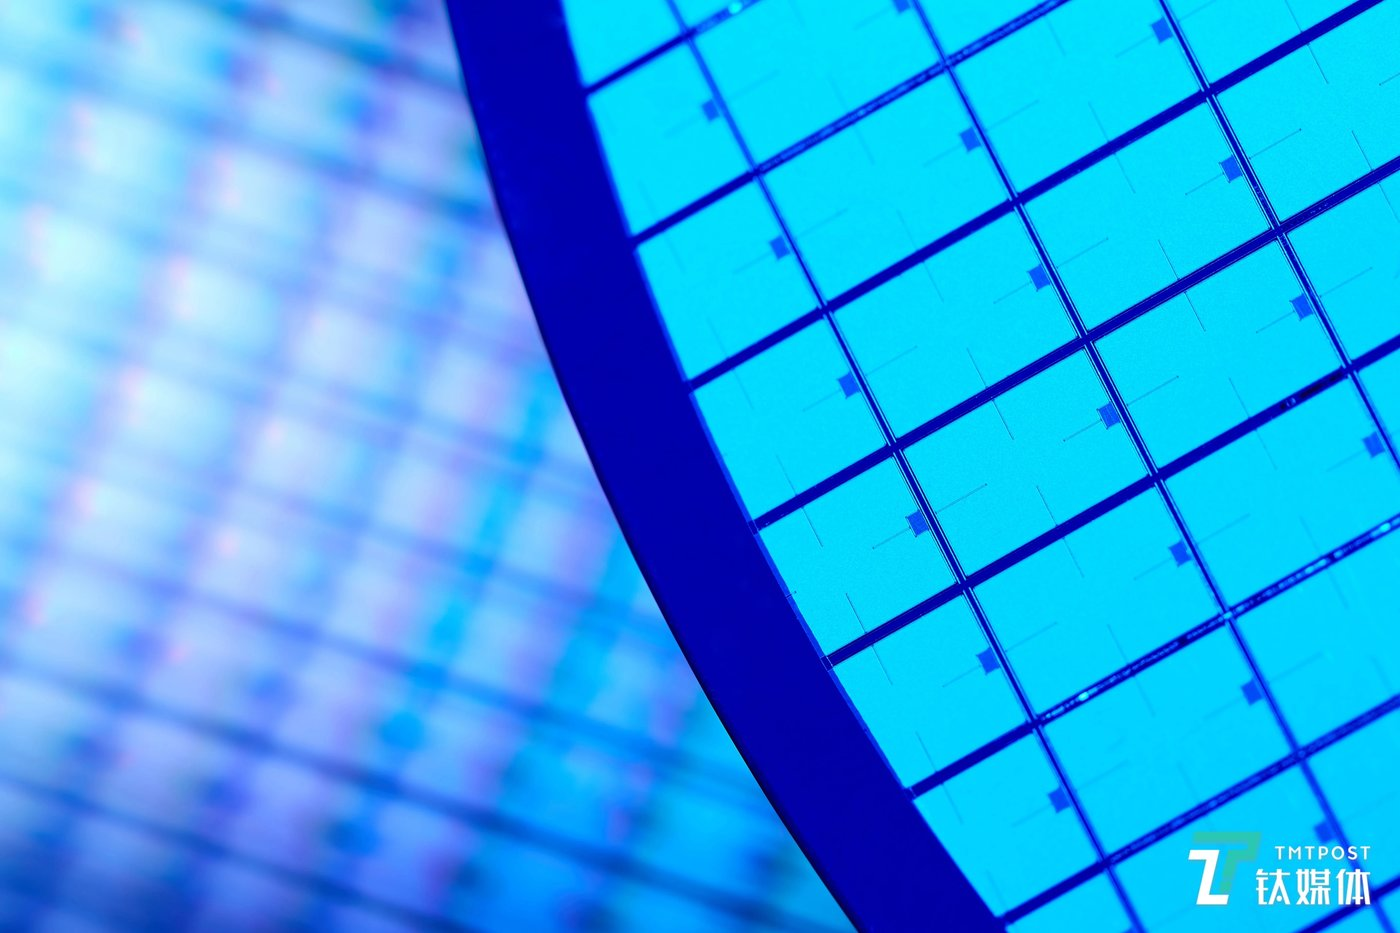 EUV工艺光刻出的晶圆样品(来源:国际半导体行业协会)